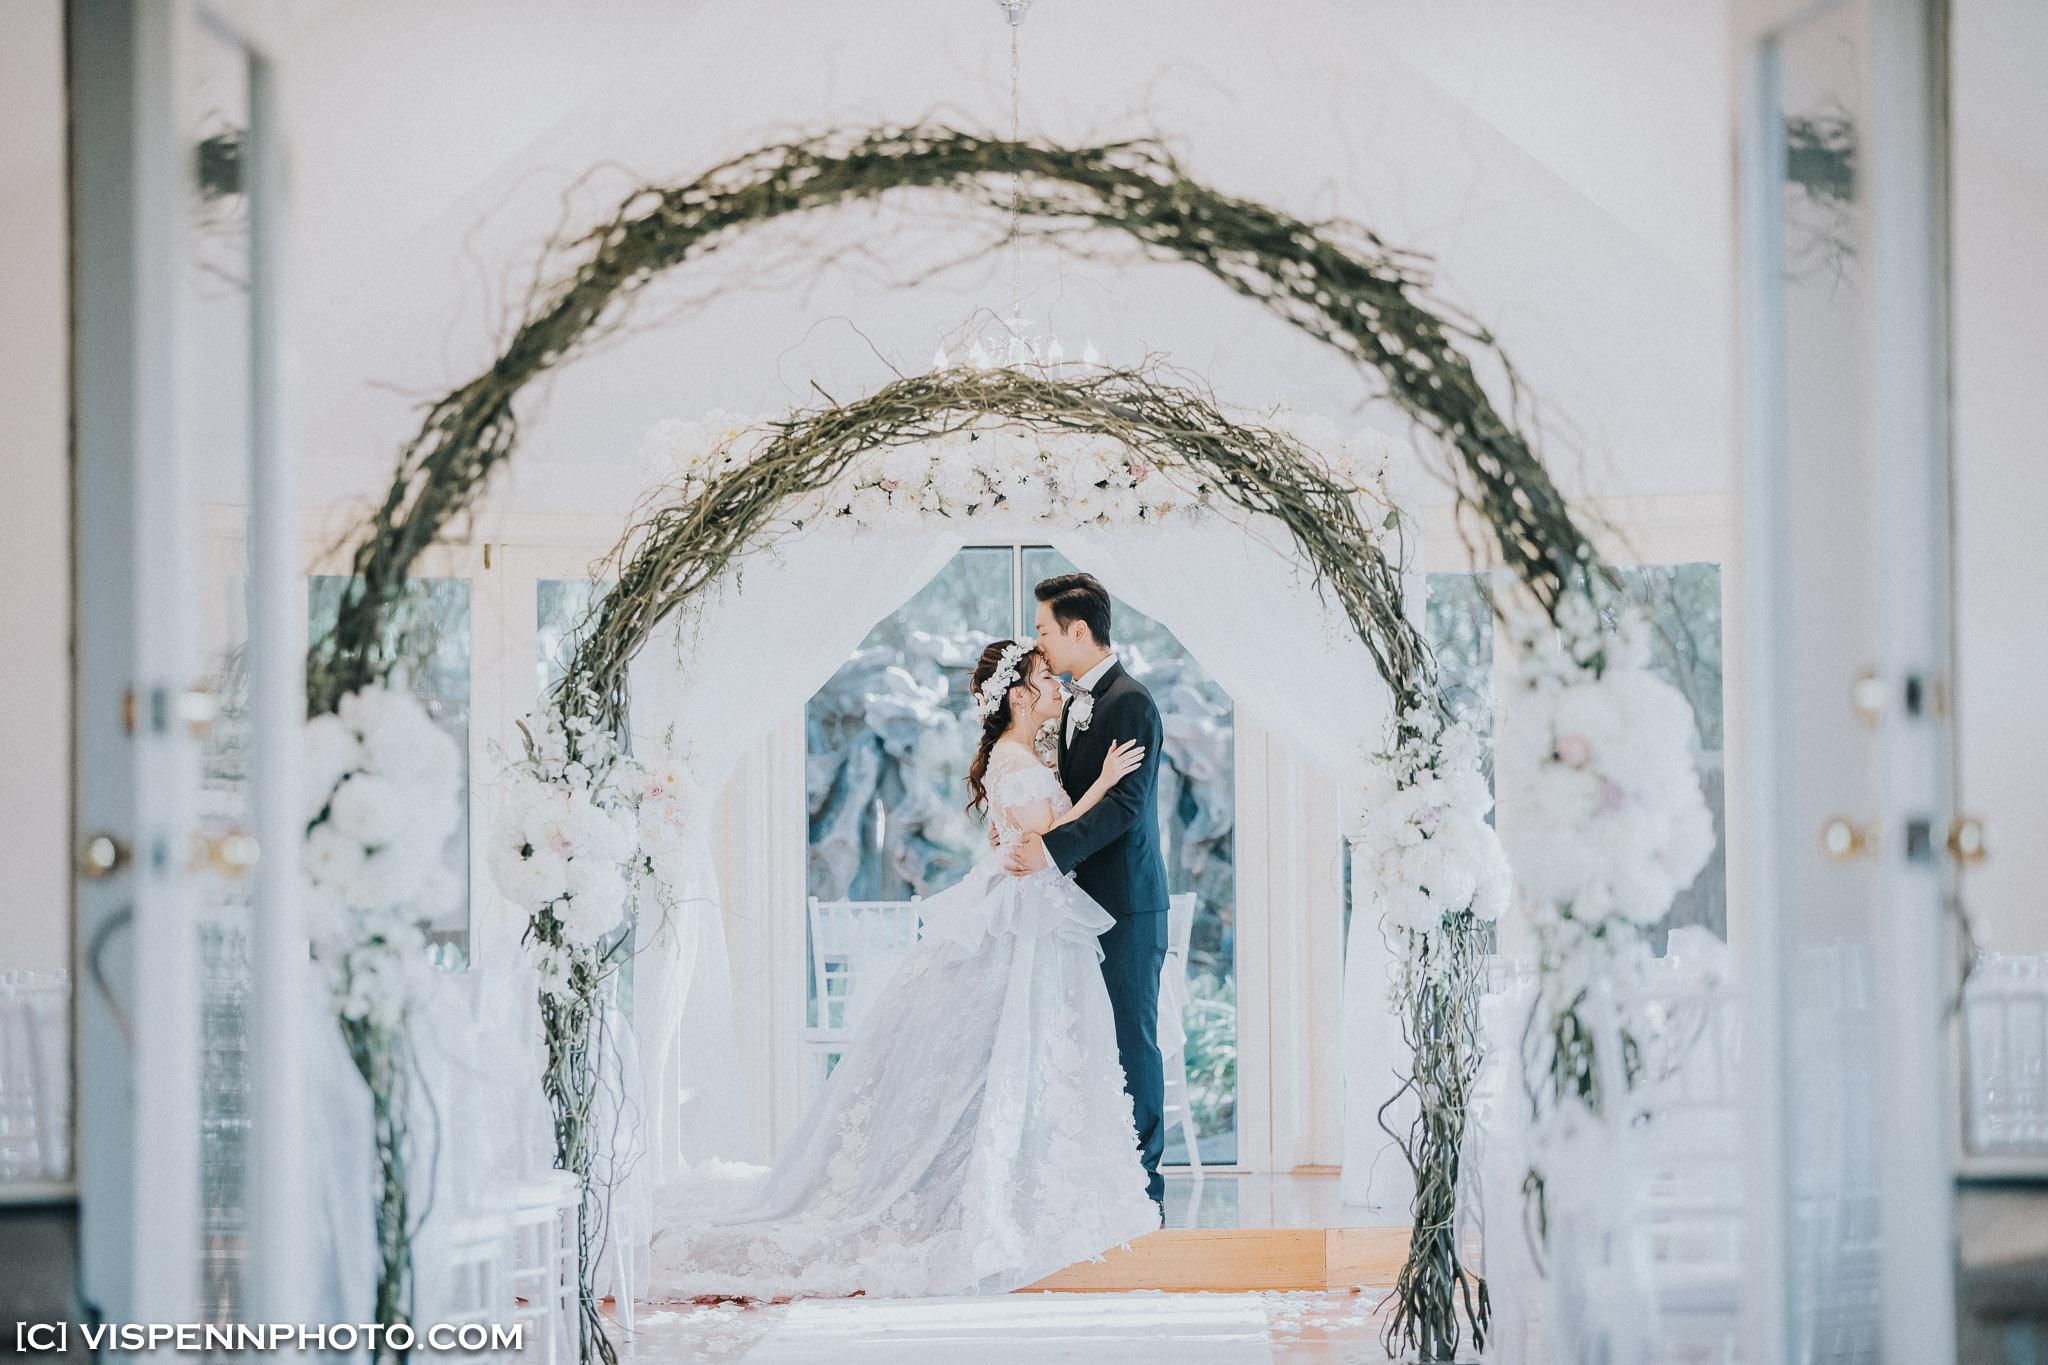 WEDDING DAY Photography Melbourne VISPENN 墨尔本 婚礼跟拍 婚礼摄像 婚礼摄影 结婚照 登记照 VISPENN H4 0567